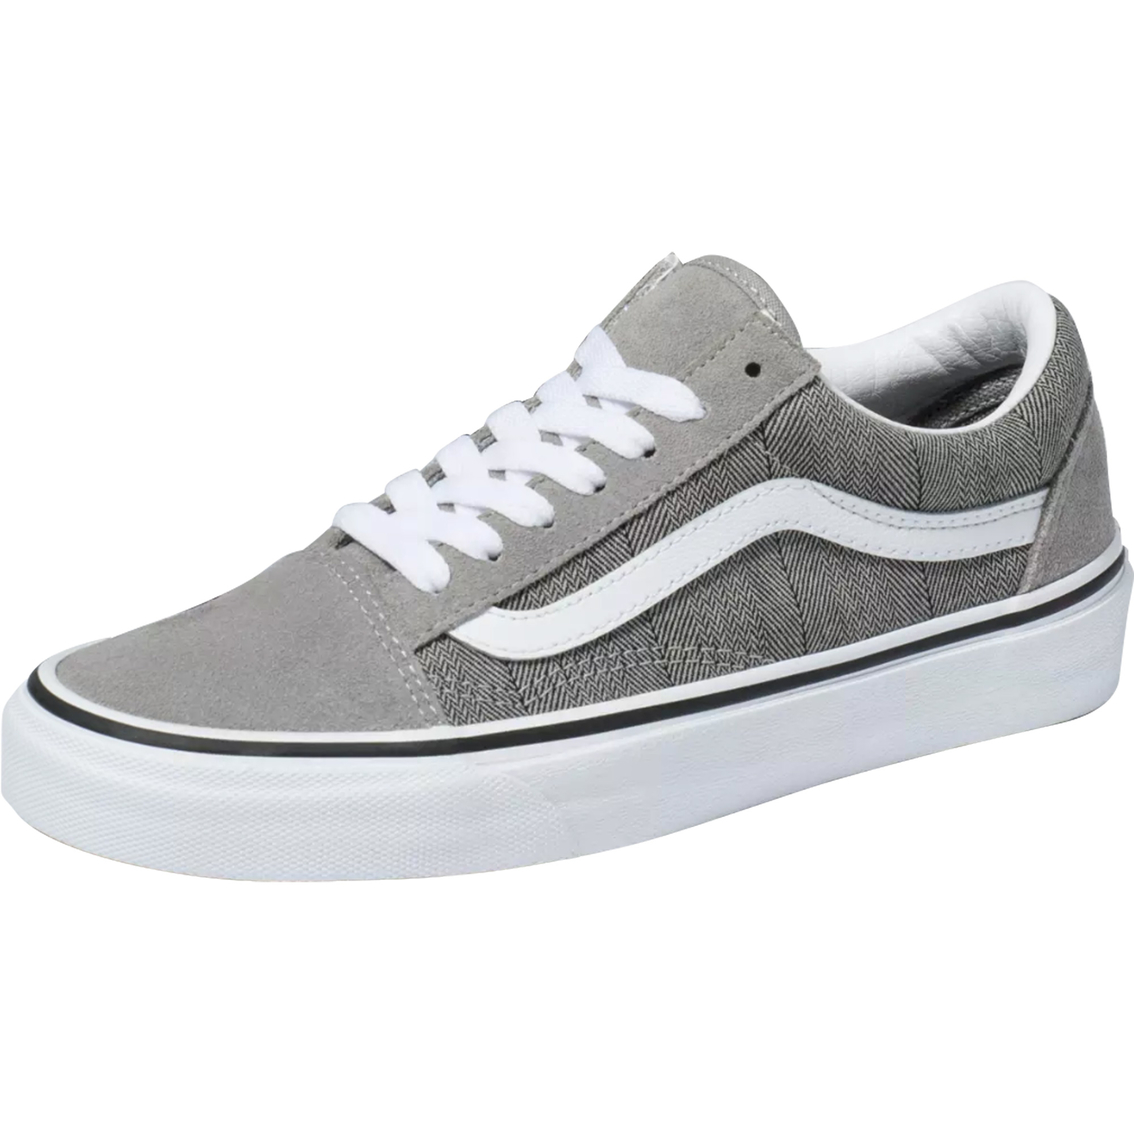 vans tennis shoes